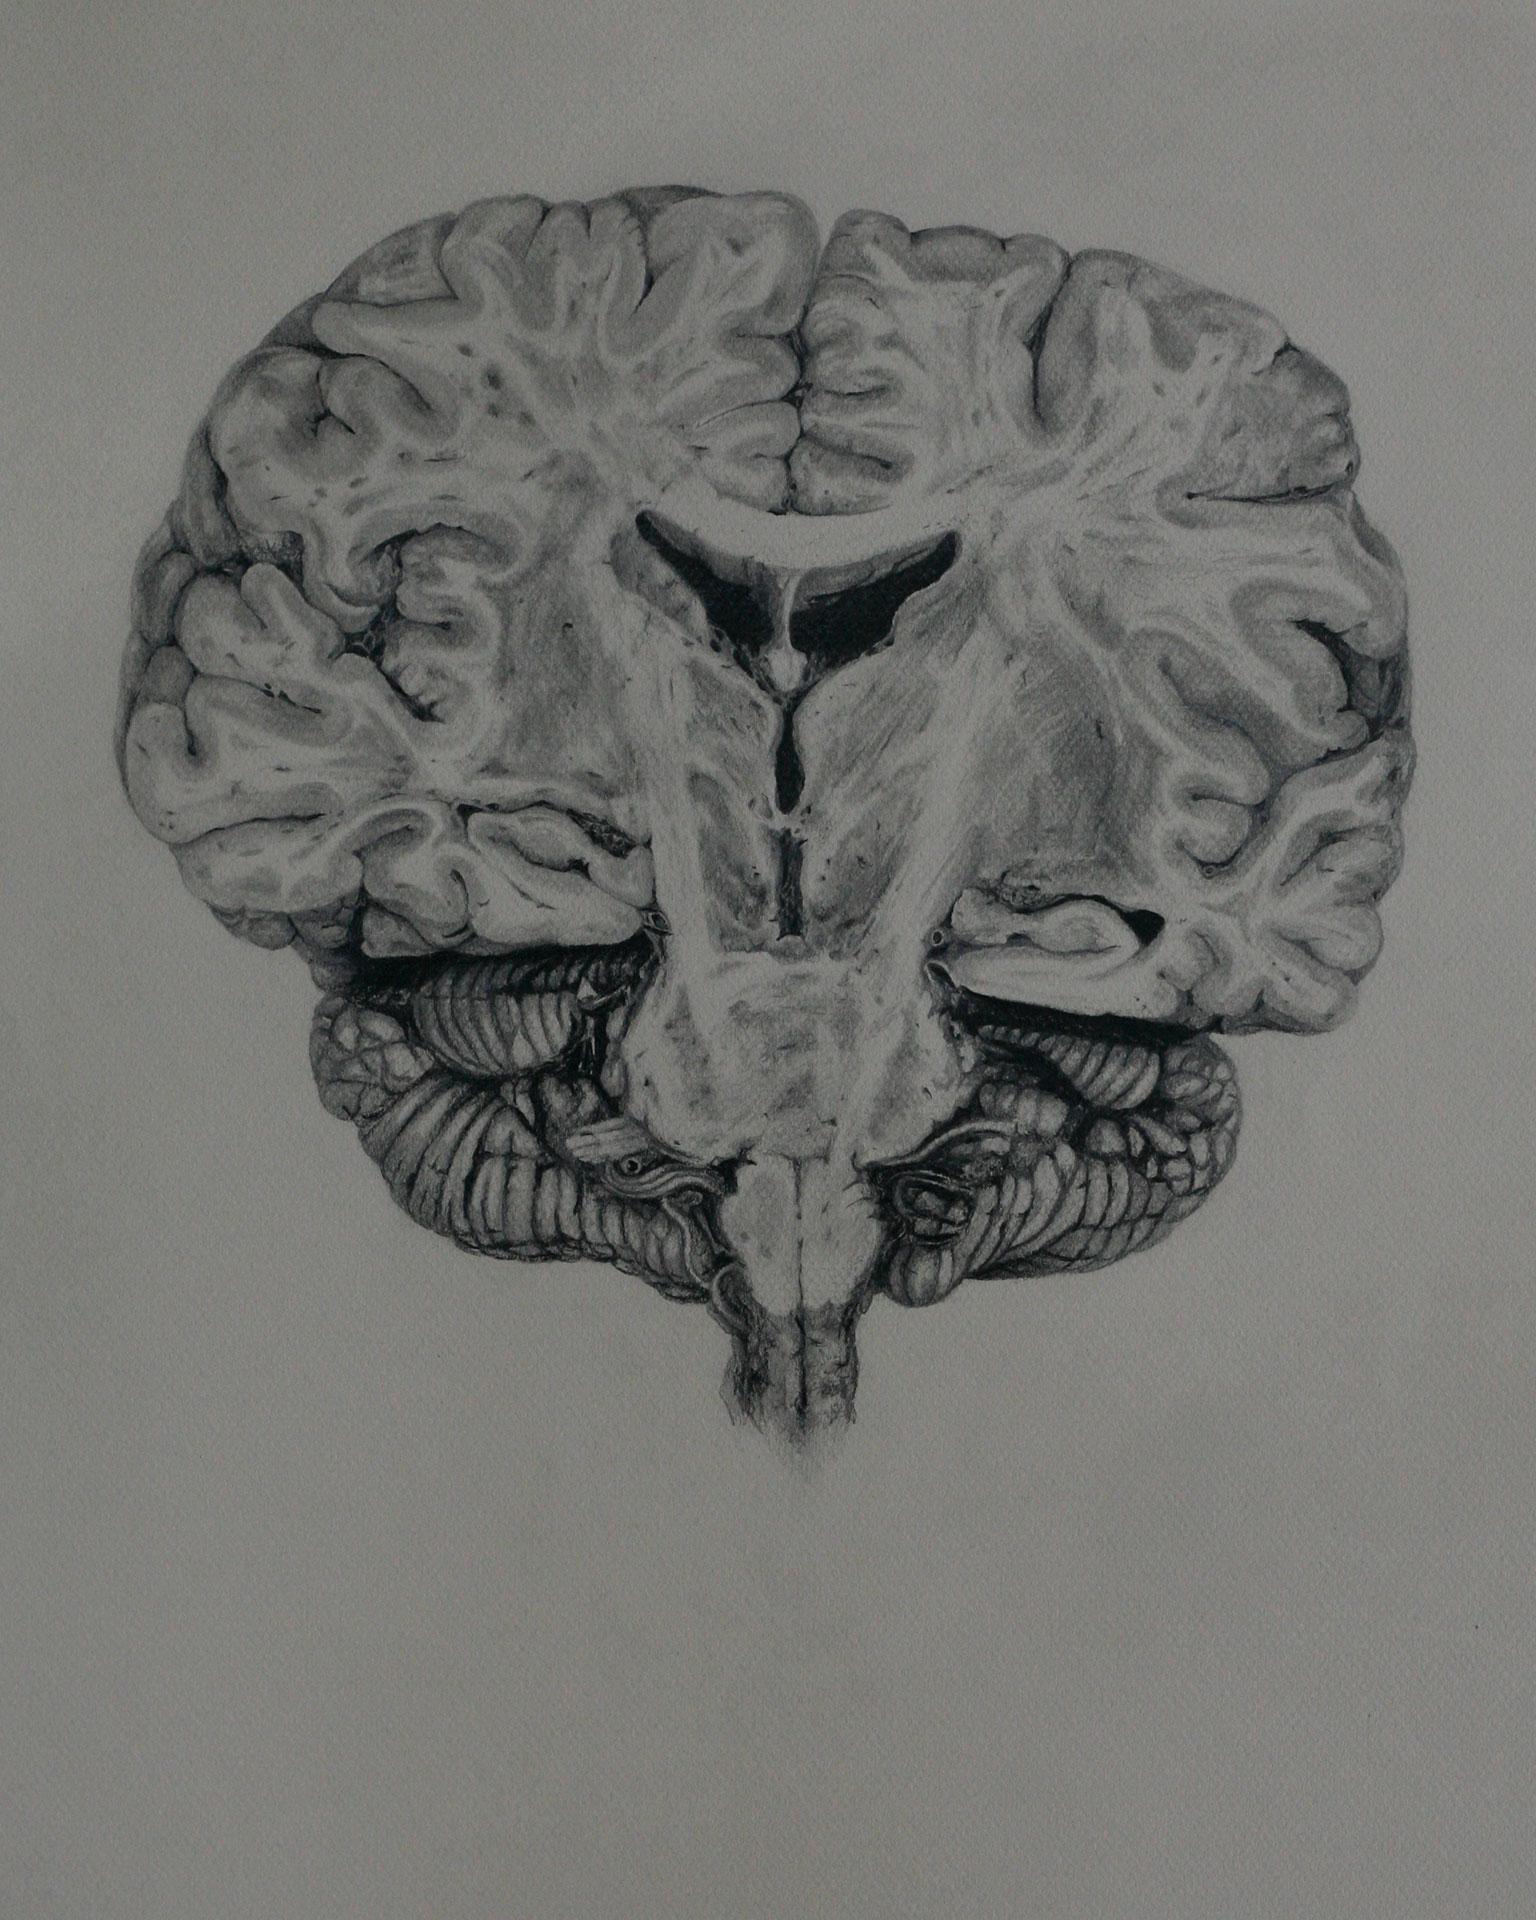 Mind and Specimen (Study no. 10)